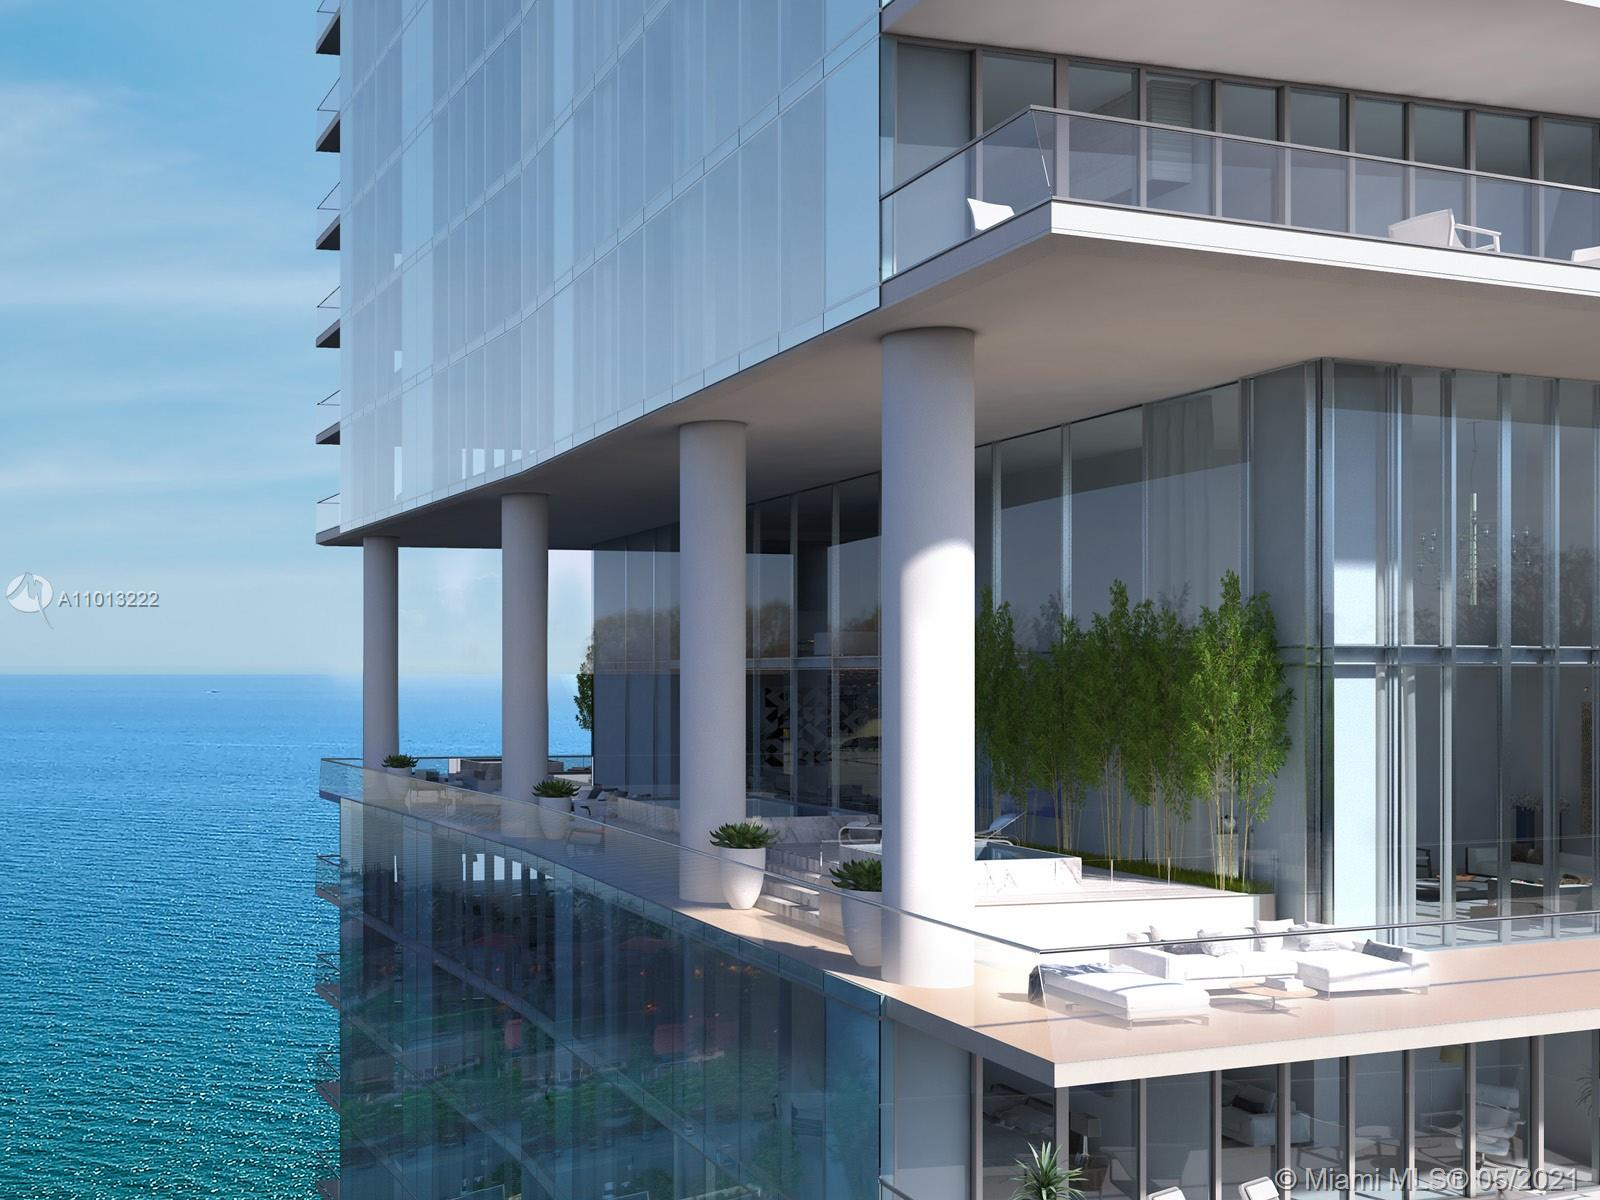 18501  COLLINS AVE #Sky Villa 3704 For Sale A11013222, FL